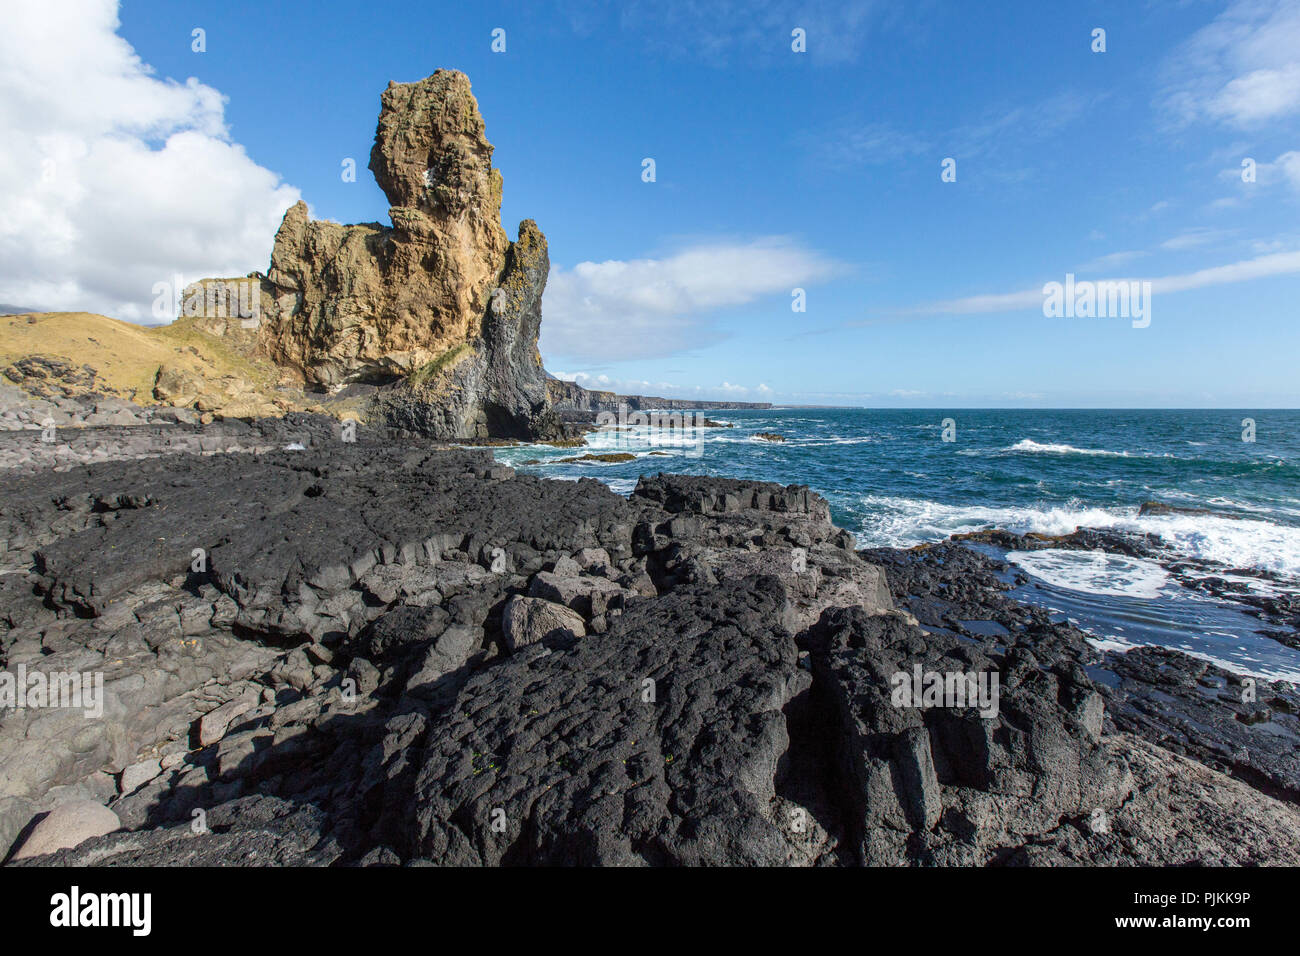 Iceland, Snaefellsnes, Cliffs of Londrangar, lava beach, volcano vent, blue sky - Stock Image